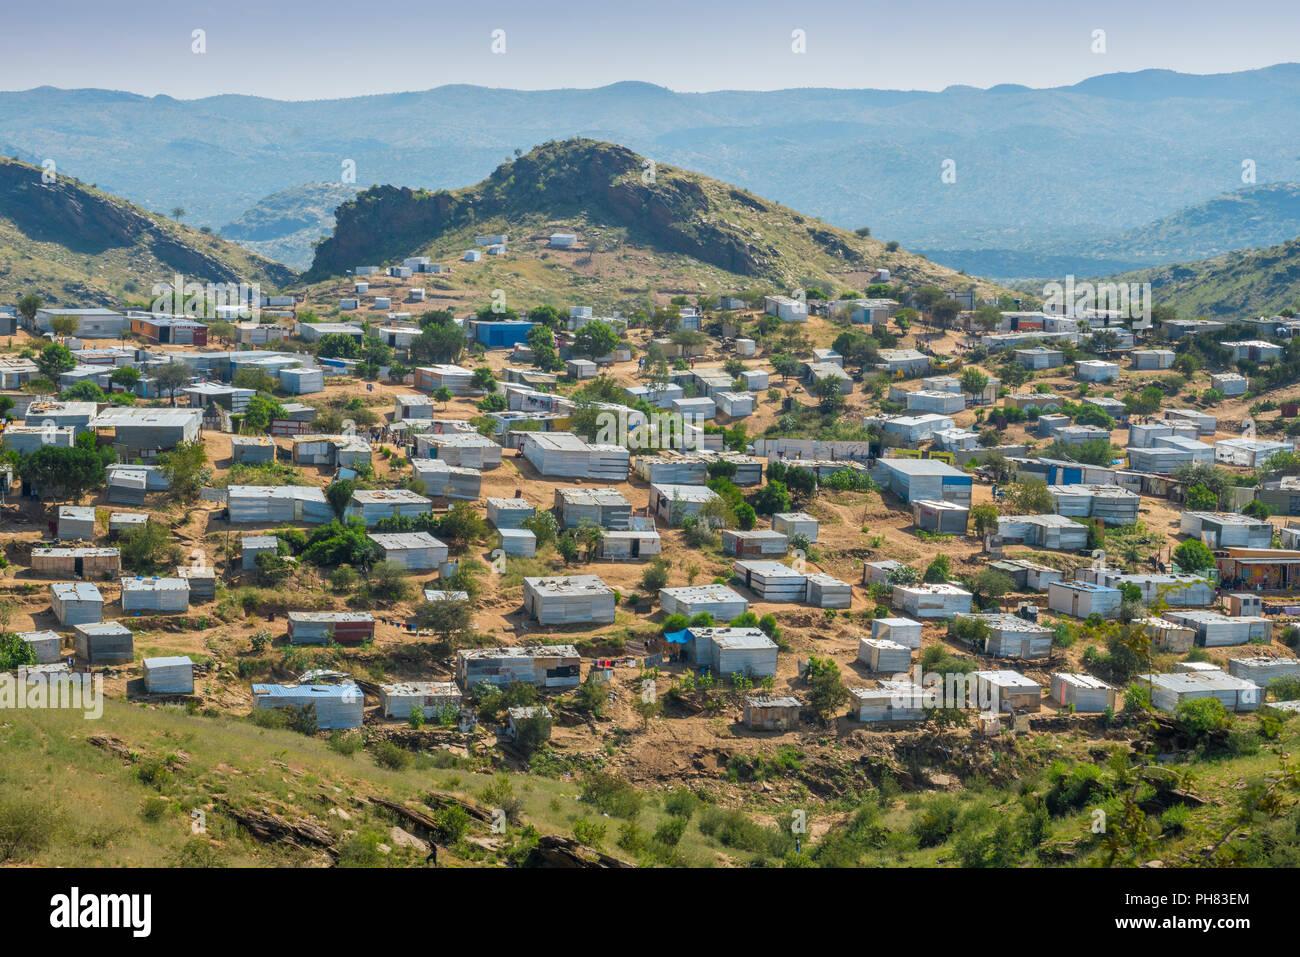 Shacks, shantytown, township, Katutura, Windhoek, Namibia - Stock Image